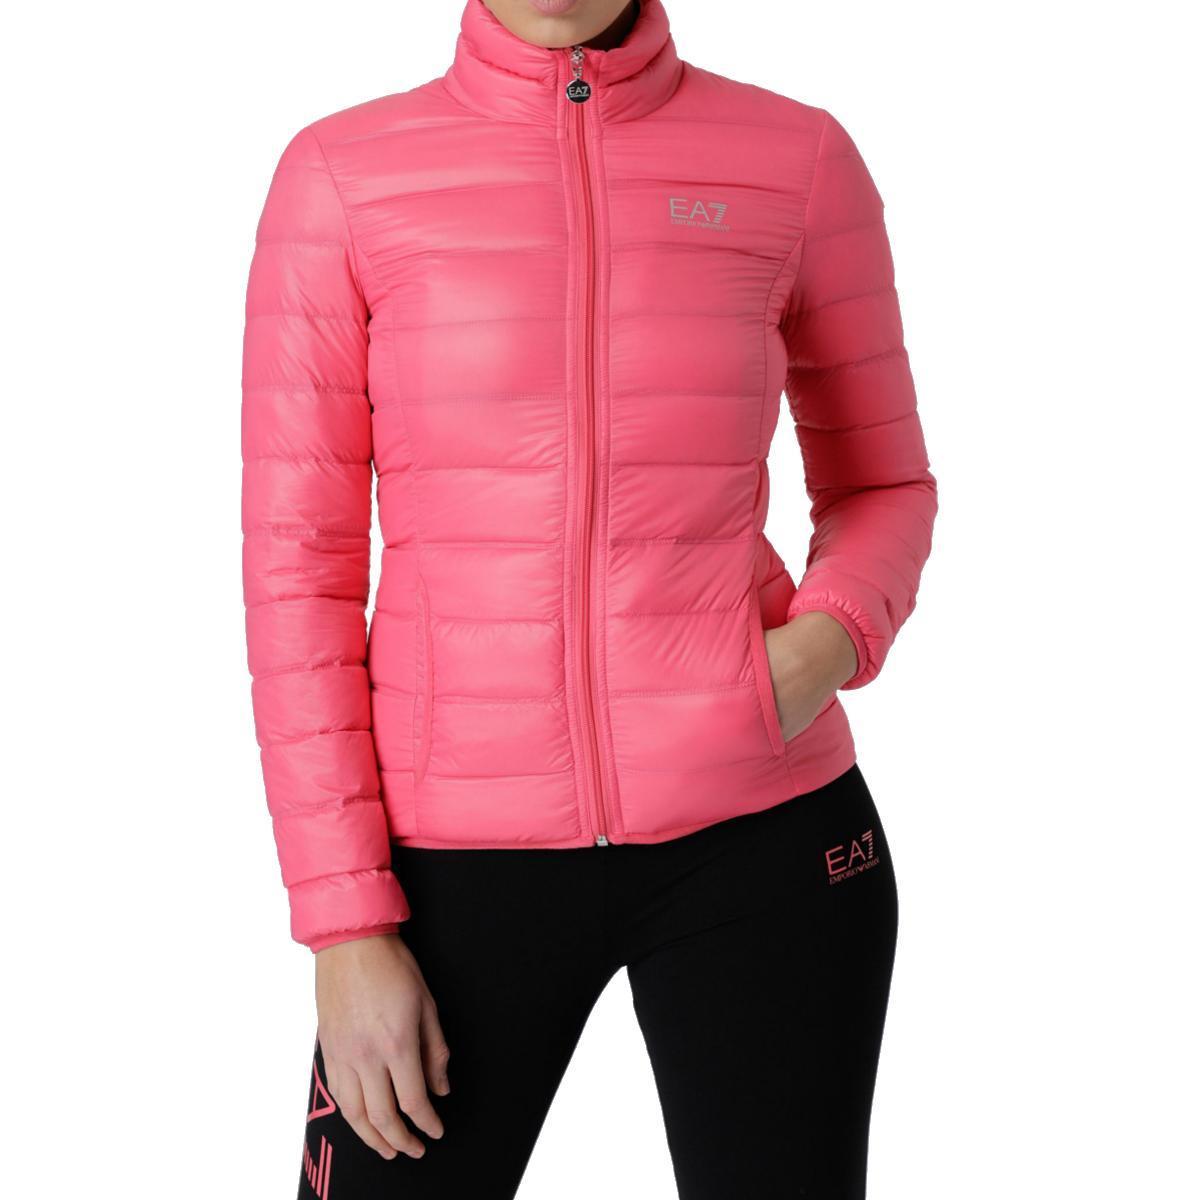 Курта пуховик женская EA7 EMPORIO ARMANI jacket BRIGHT ROSE